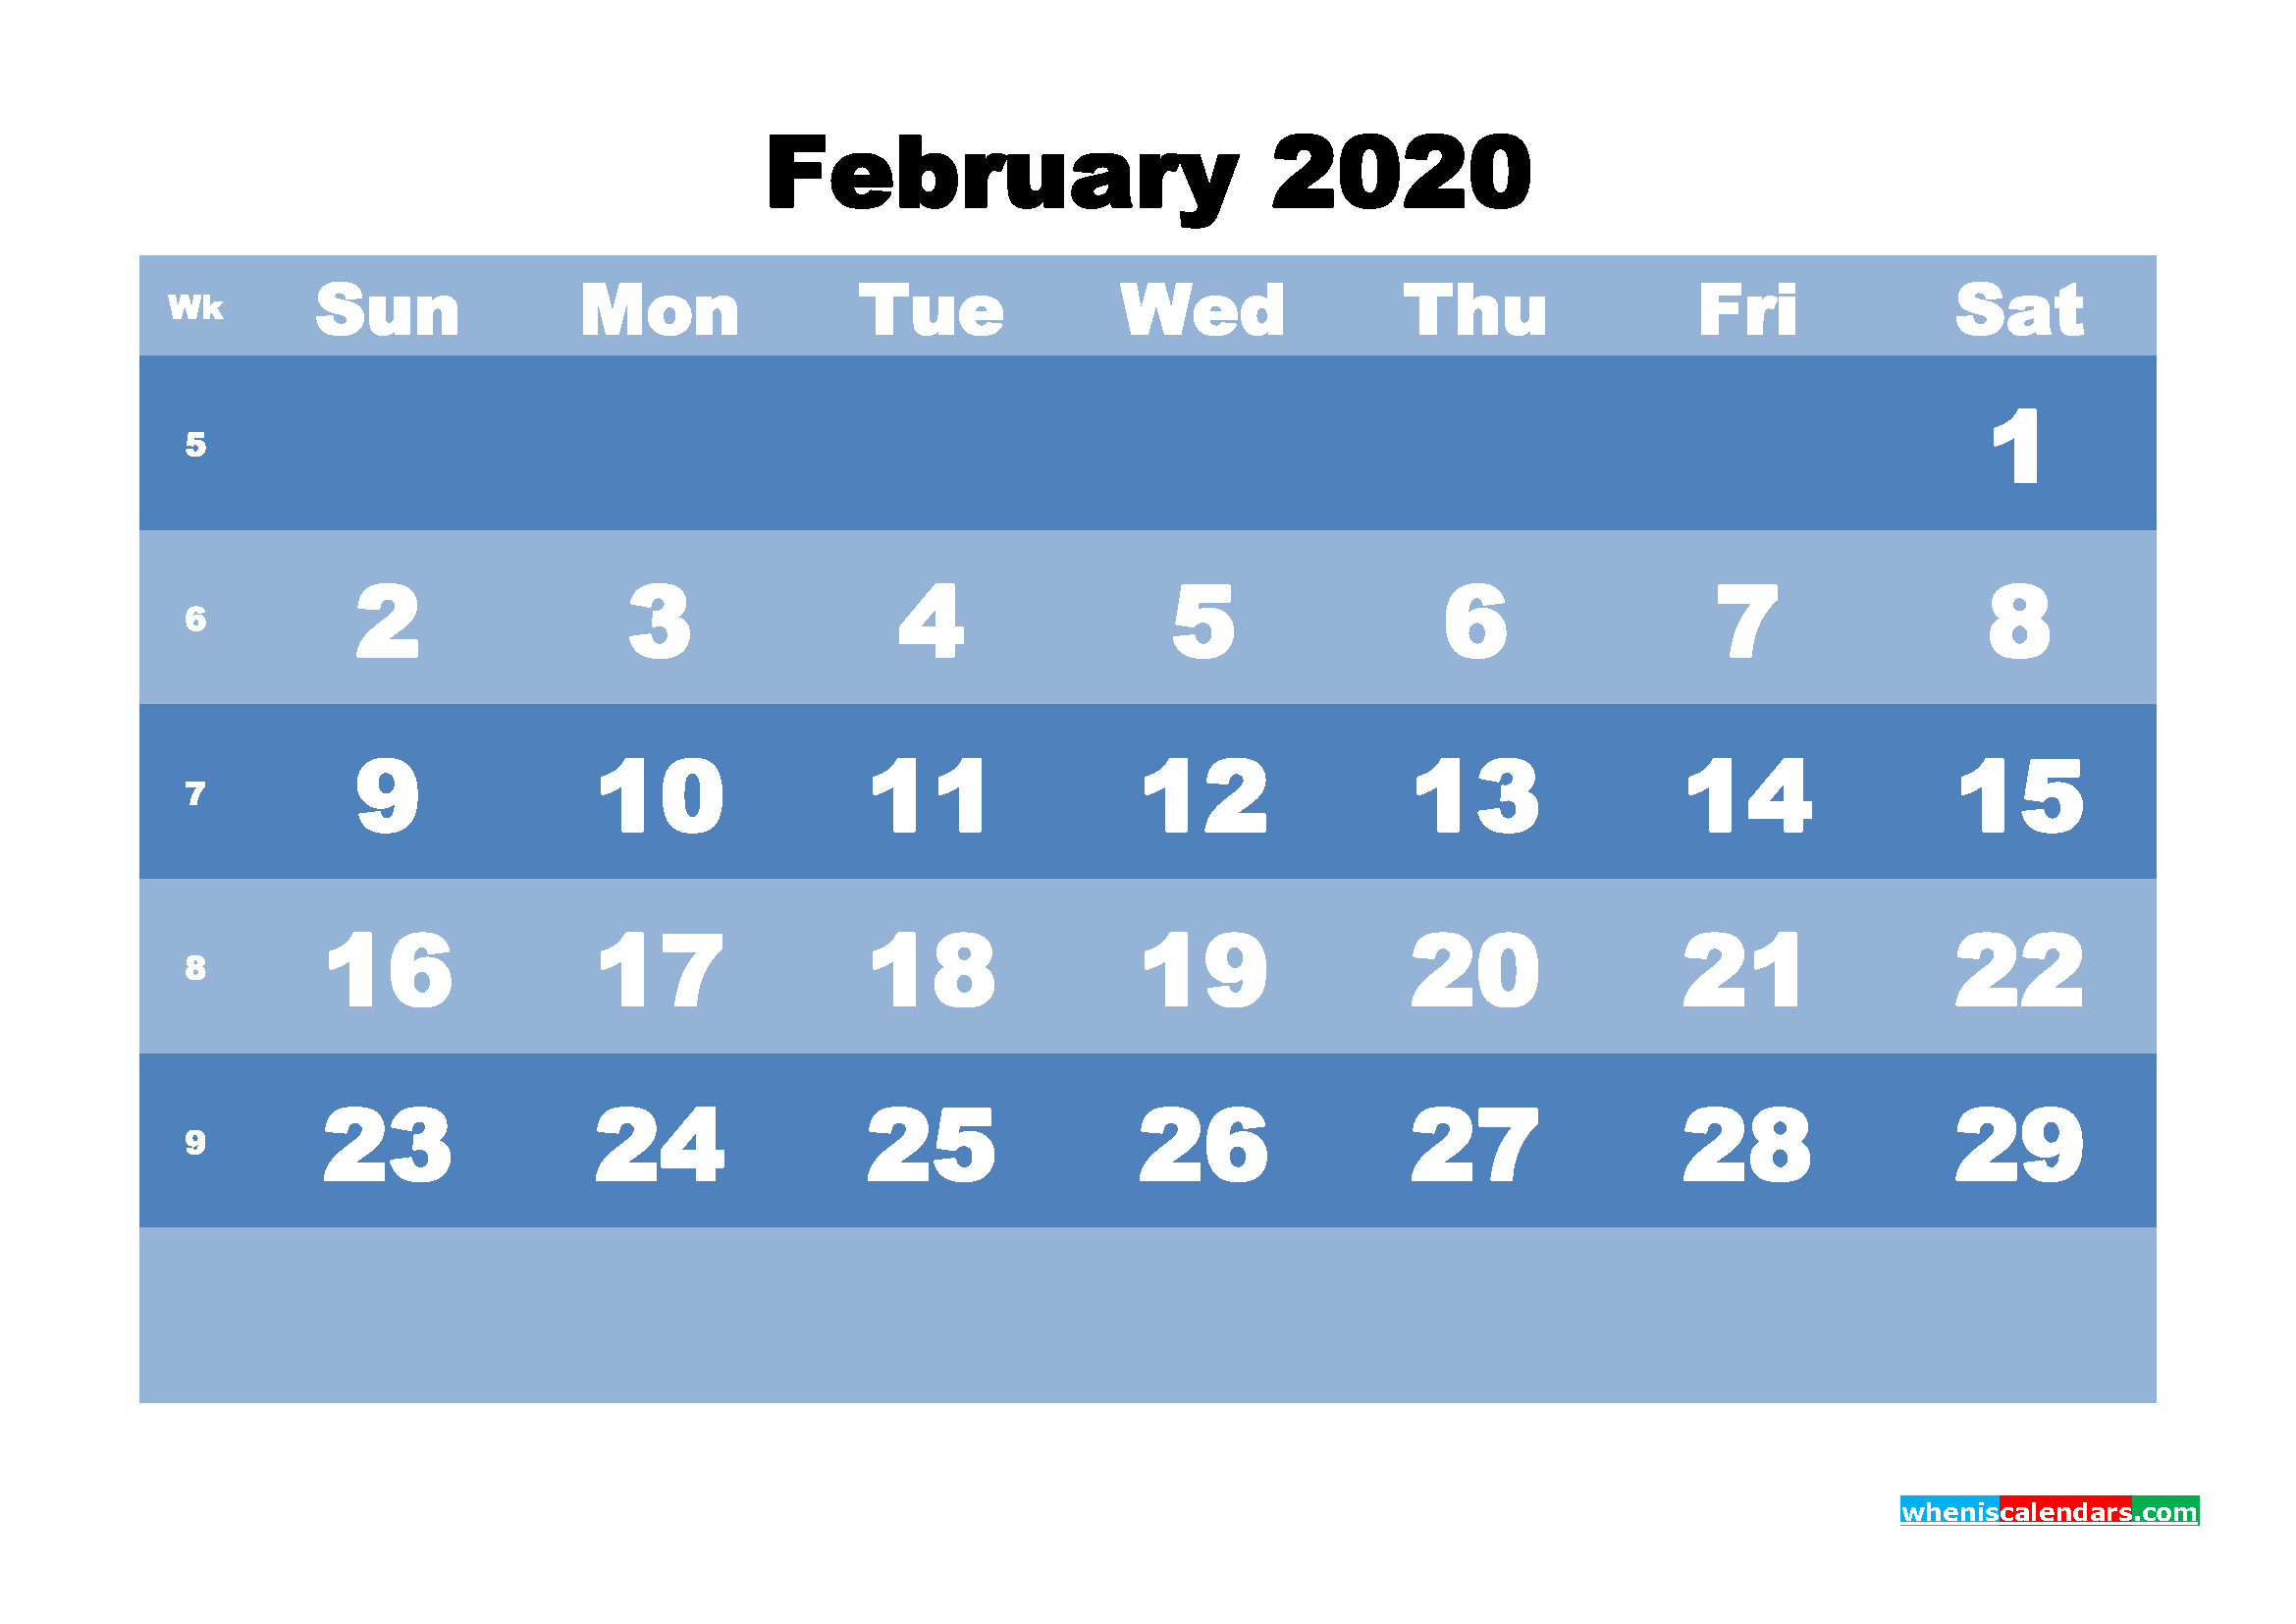 February Printable Calendar 2020 PDF, Word - No.m20b518